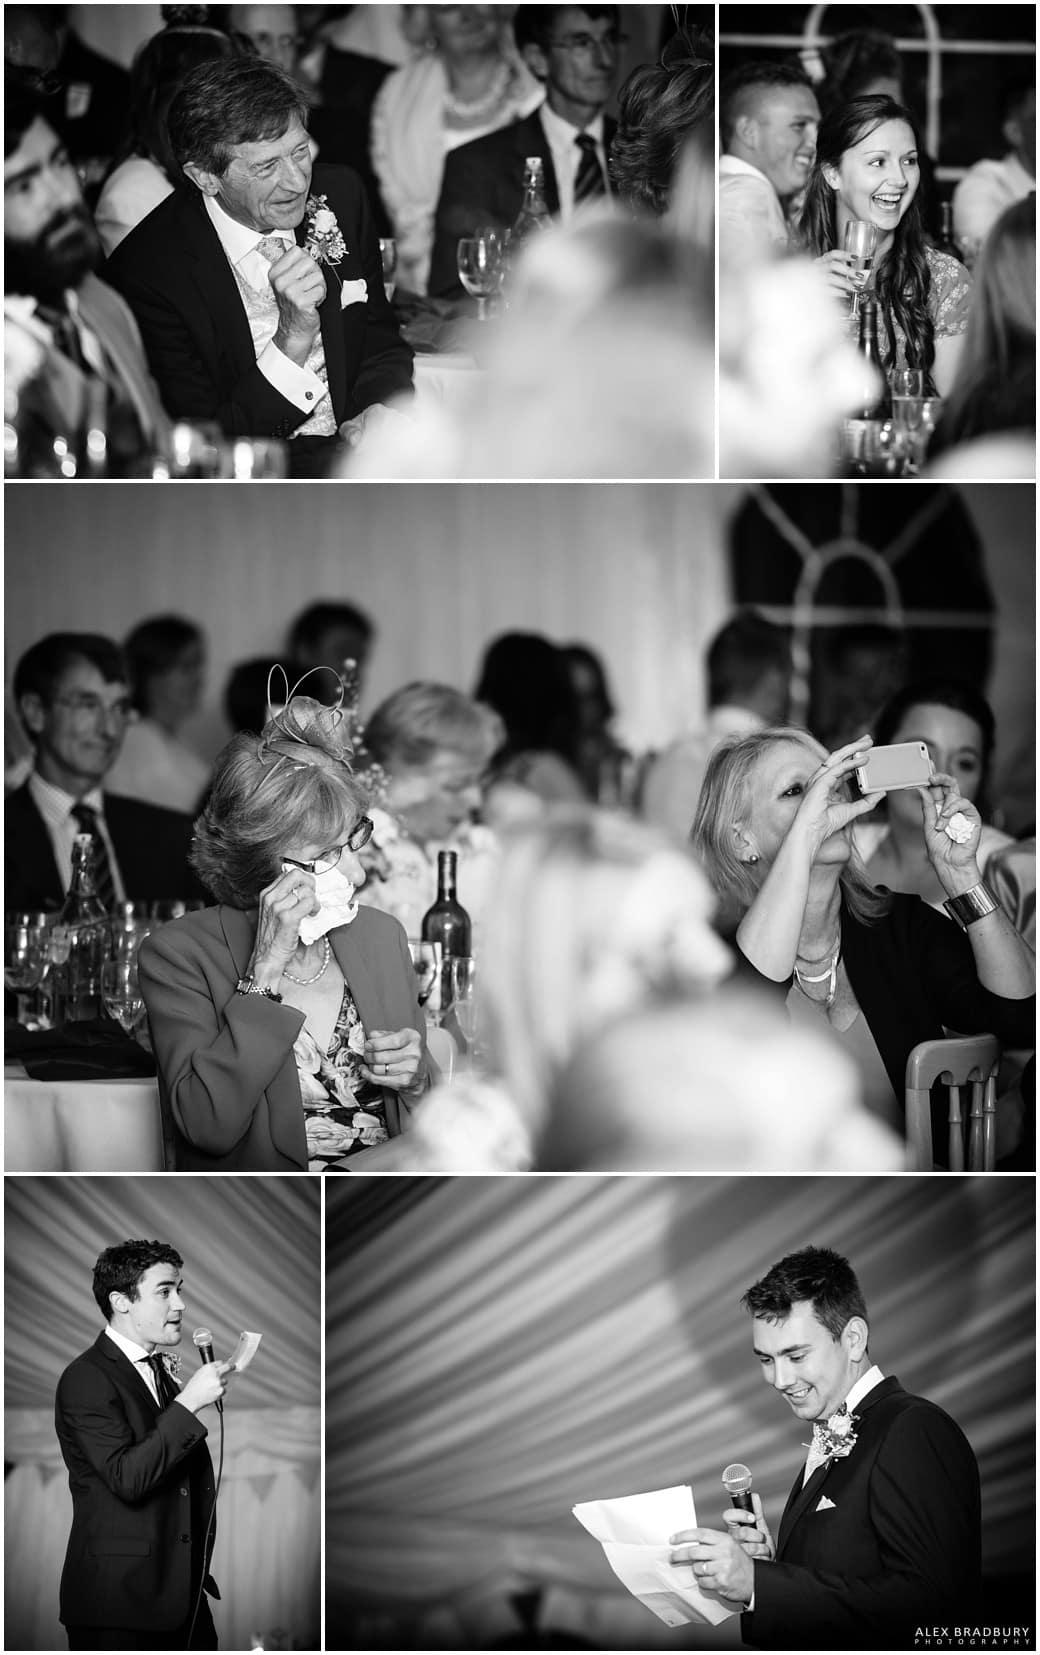 alex-bradbury-sussex-wedding-photography-44